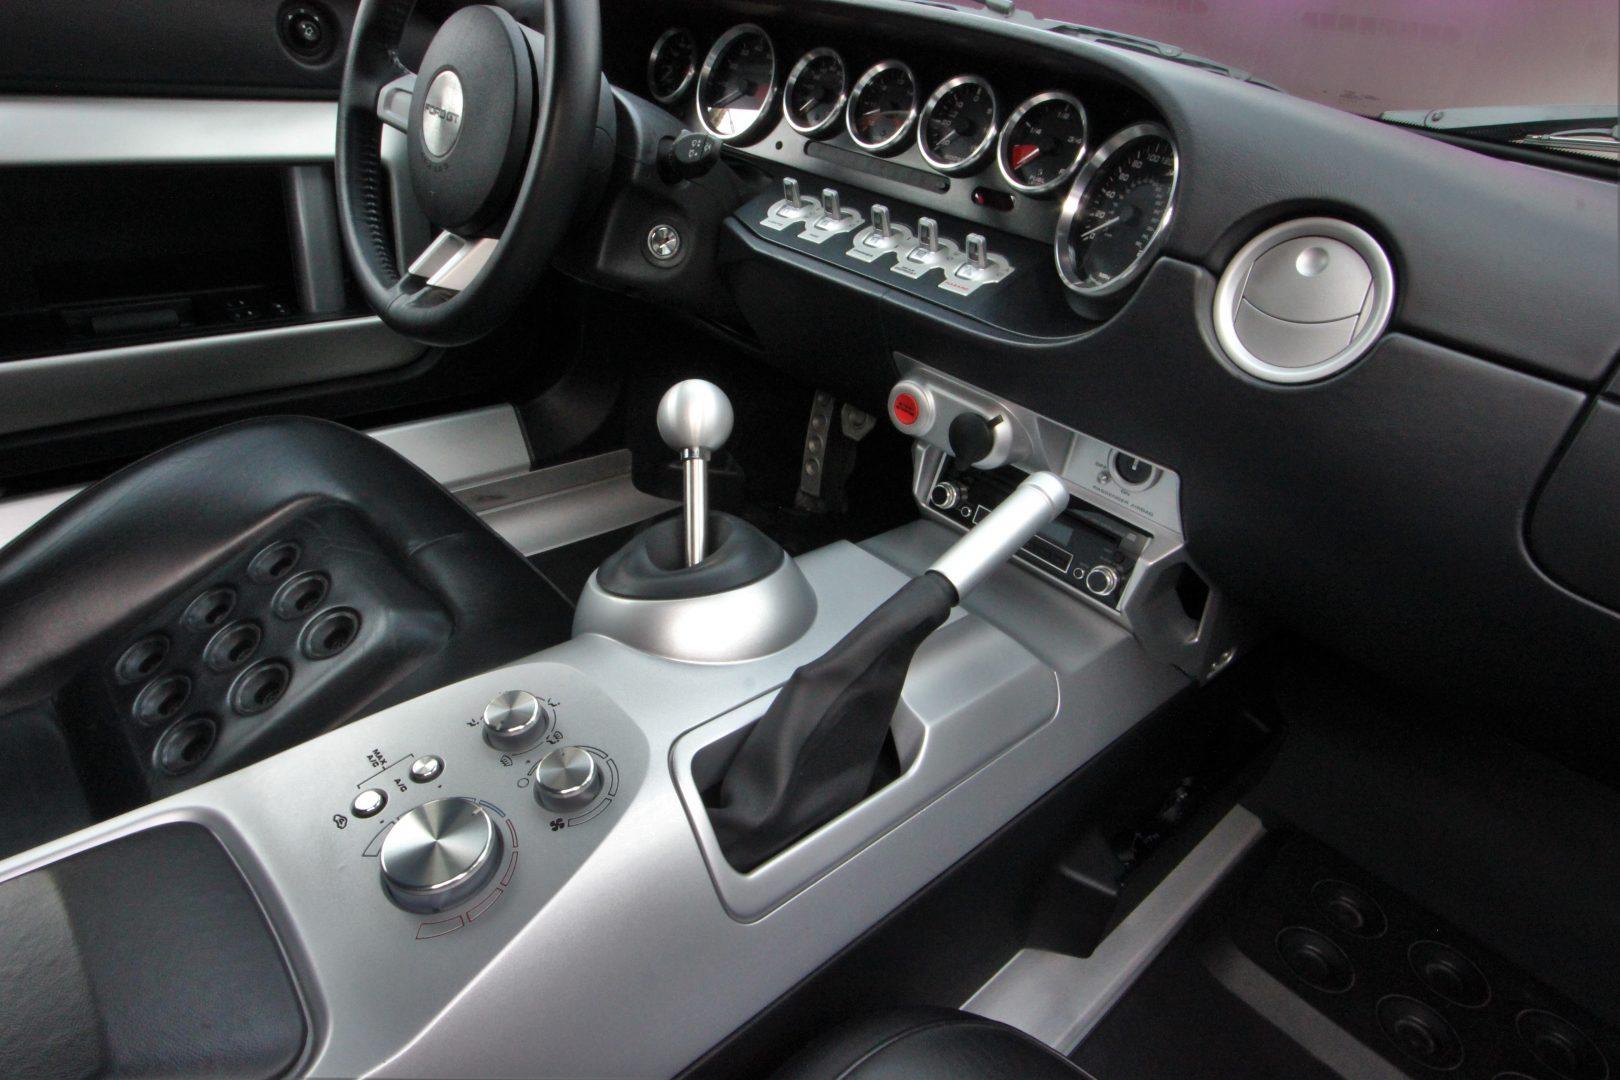 AIL Ford GT 5.4L V8 Supercharger 6